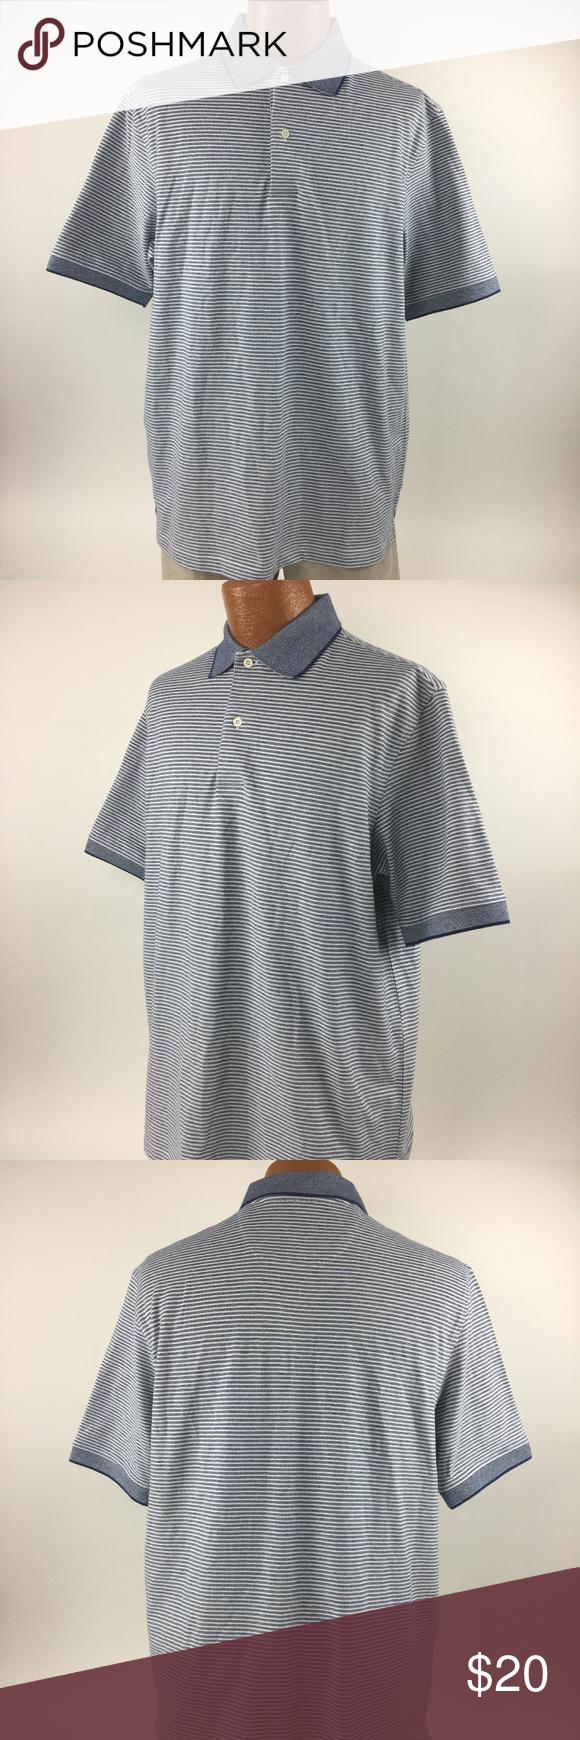 JoS. A. Bank Shirt Size M Short Sleeve Polo!. NWT Bank